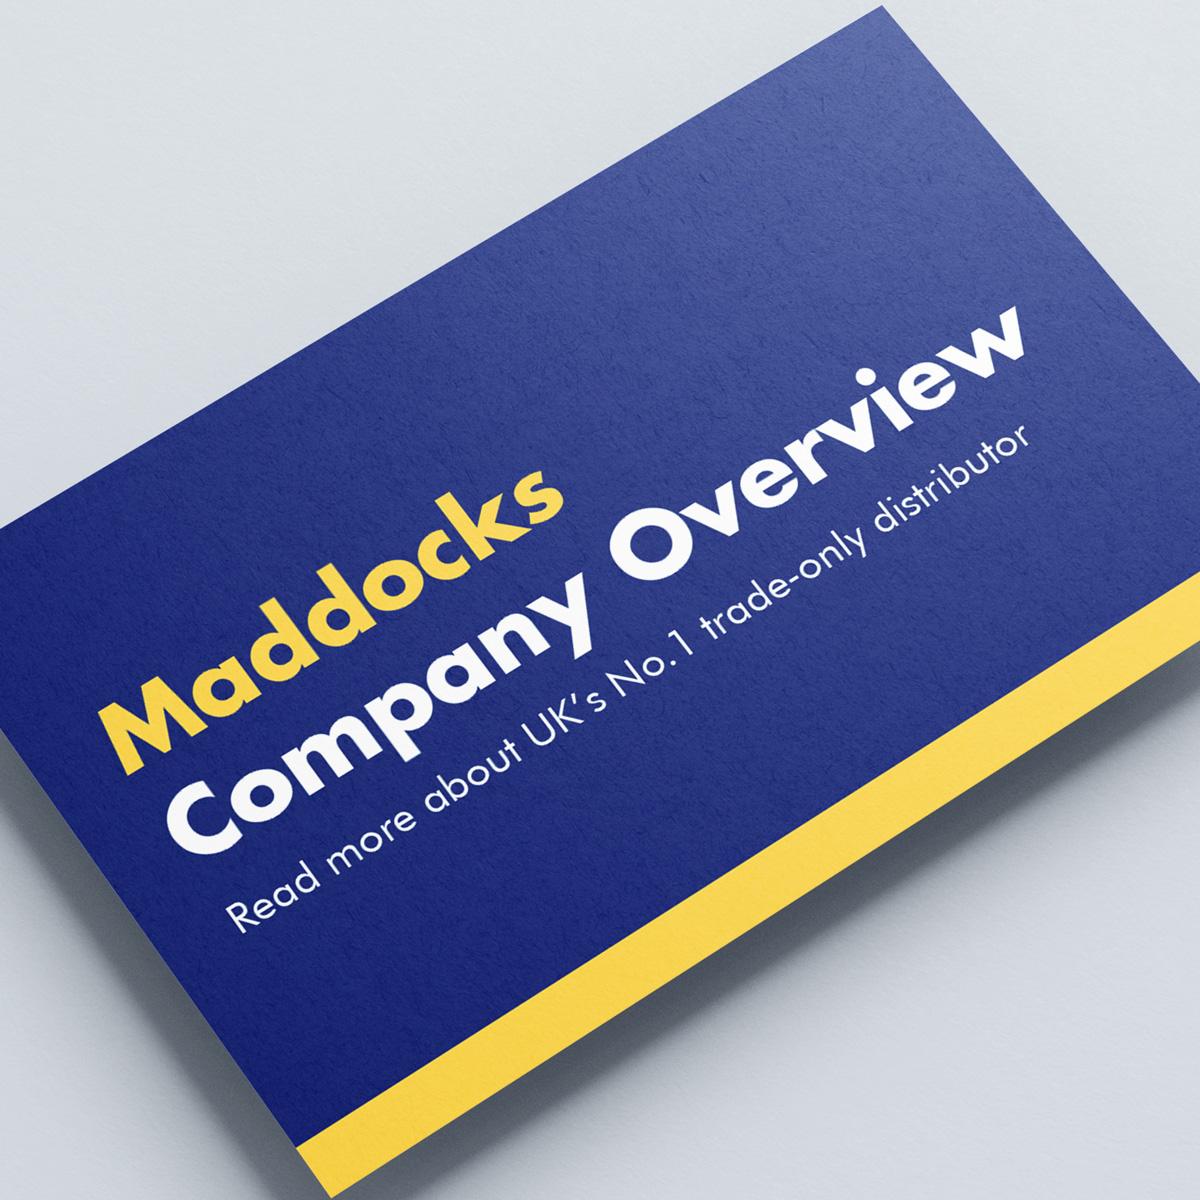 Überblick zu Maddocks